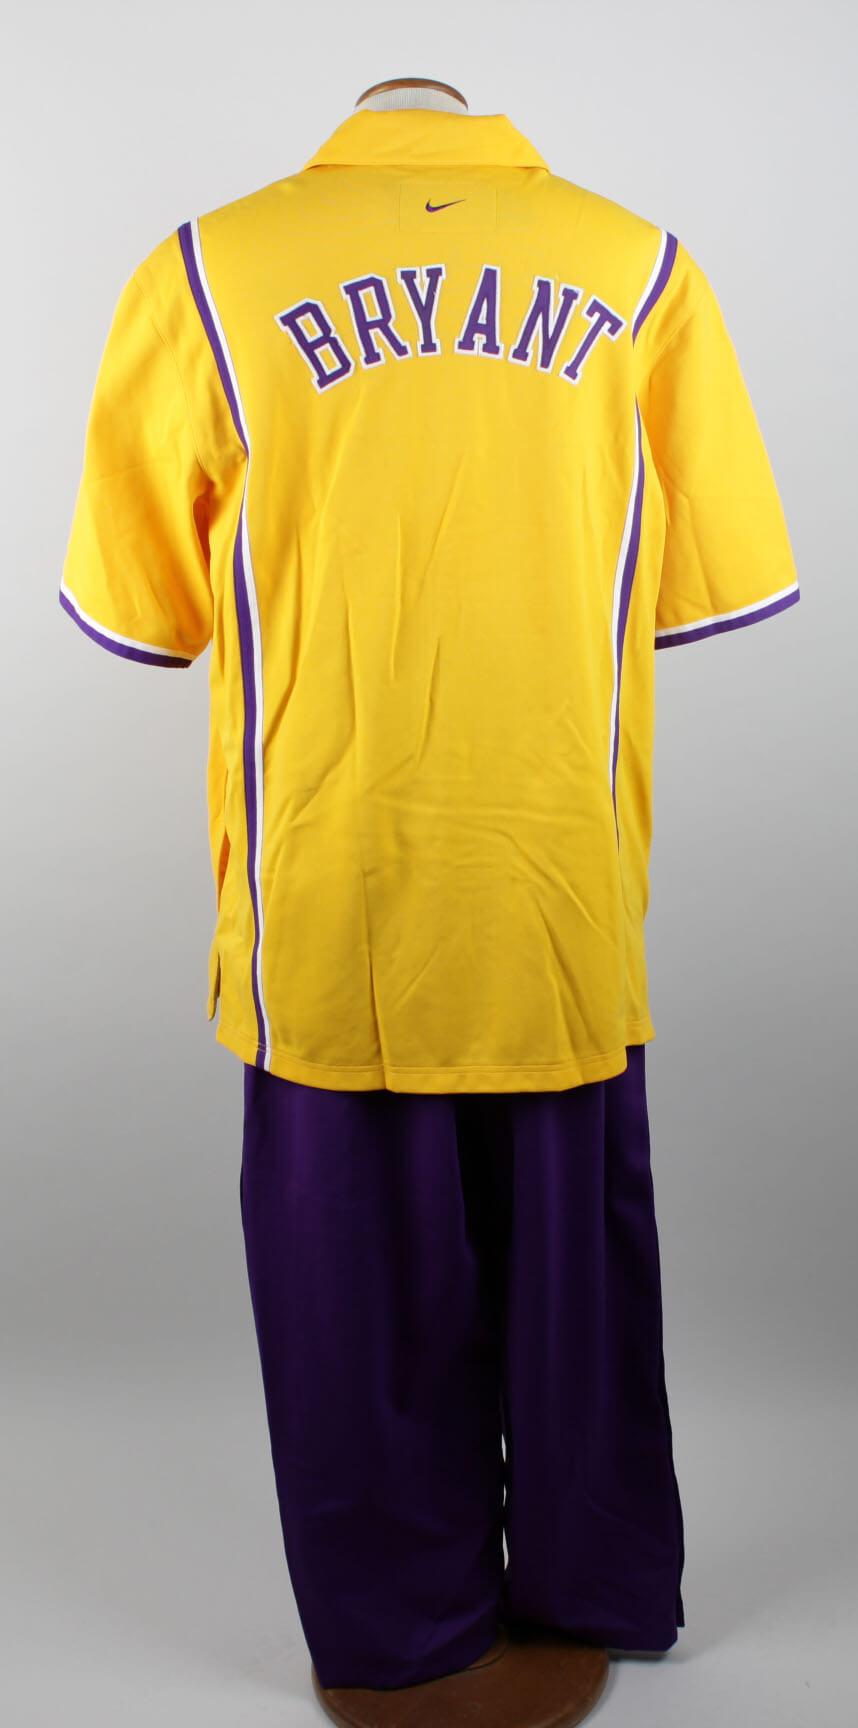 1998-99 Los Angeles Lakers - Kobe Bryant Game-Worn Warm-Up Uniform (Shooting Shirt & Pants)